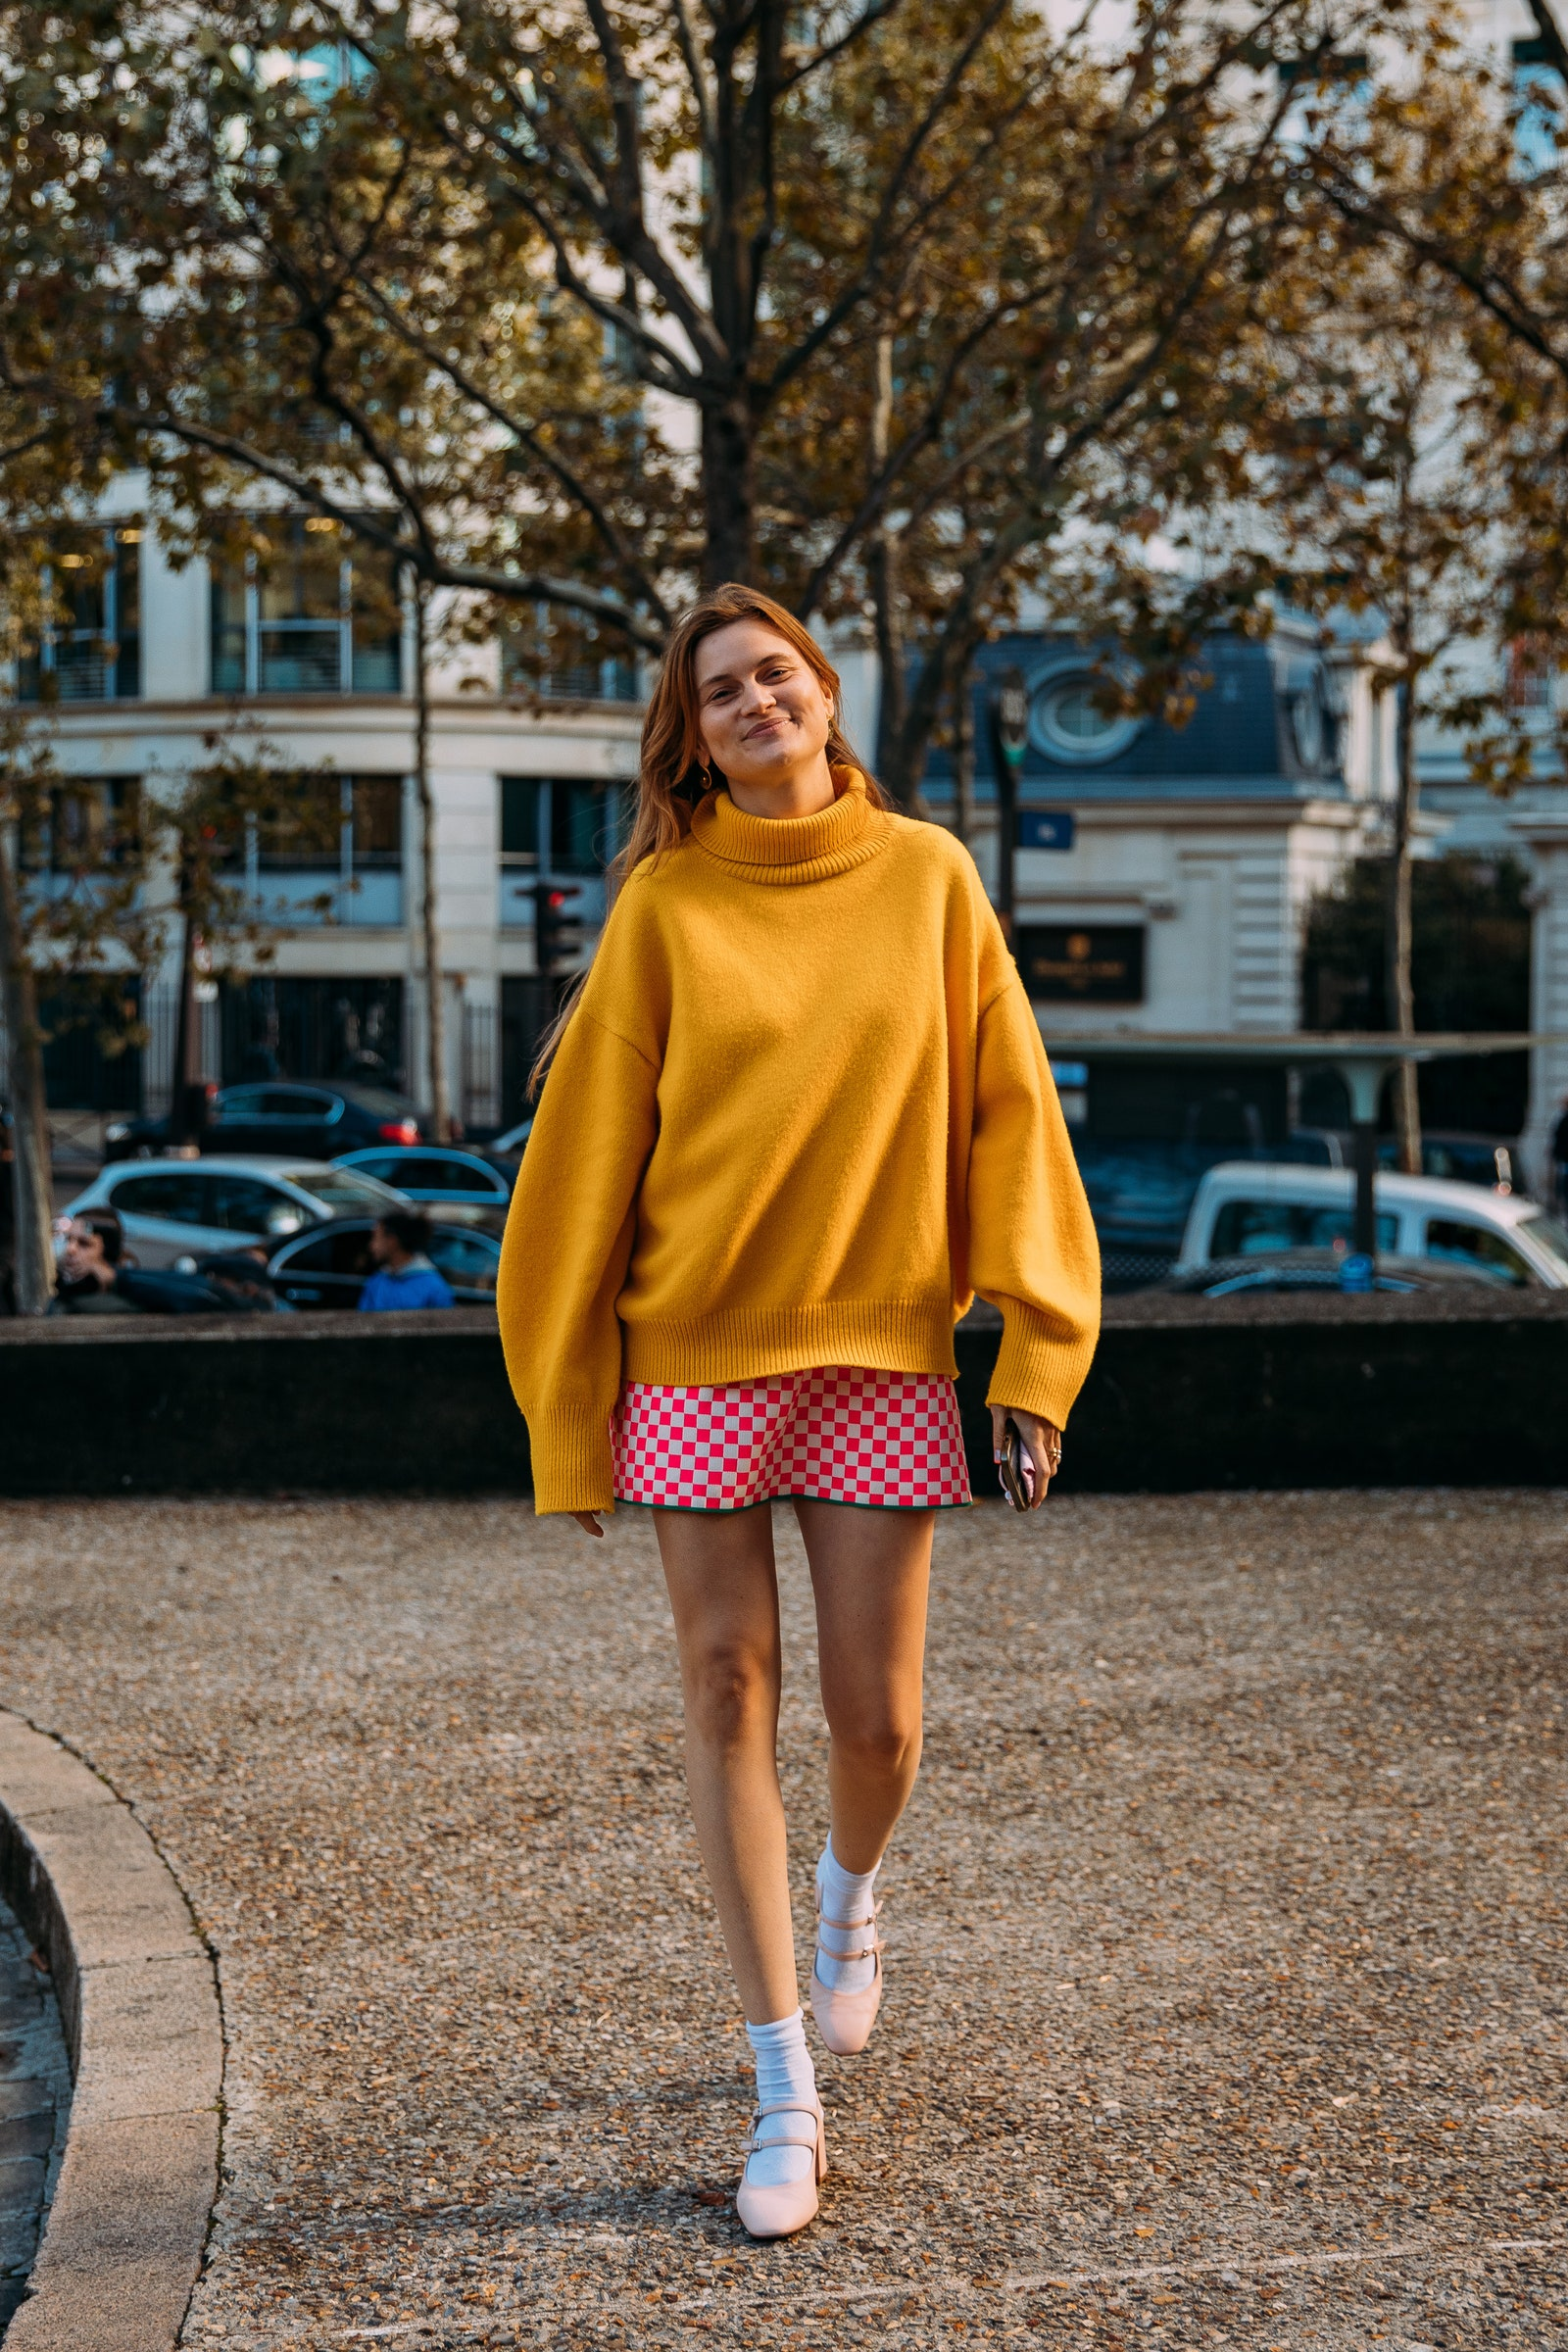 paris-street-style-6-1634222605244933973406.jpeg